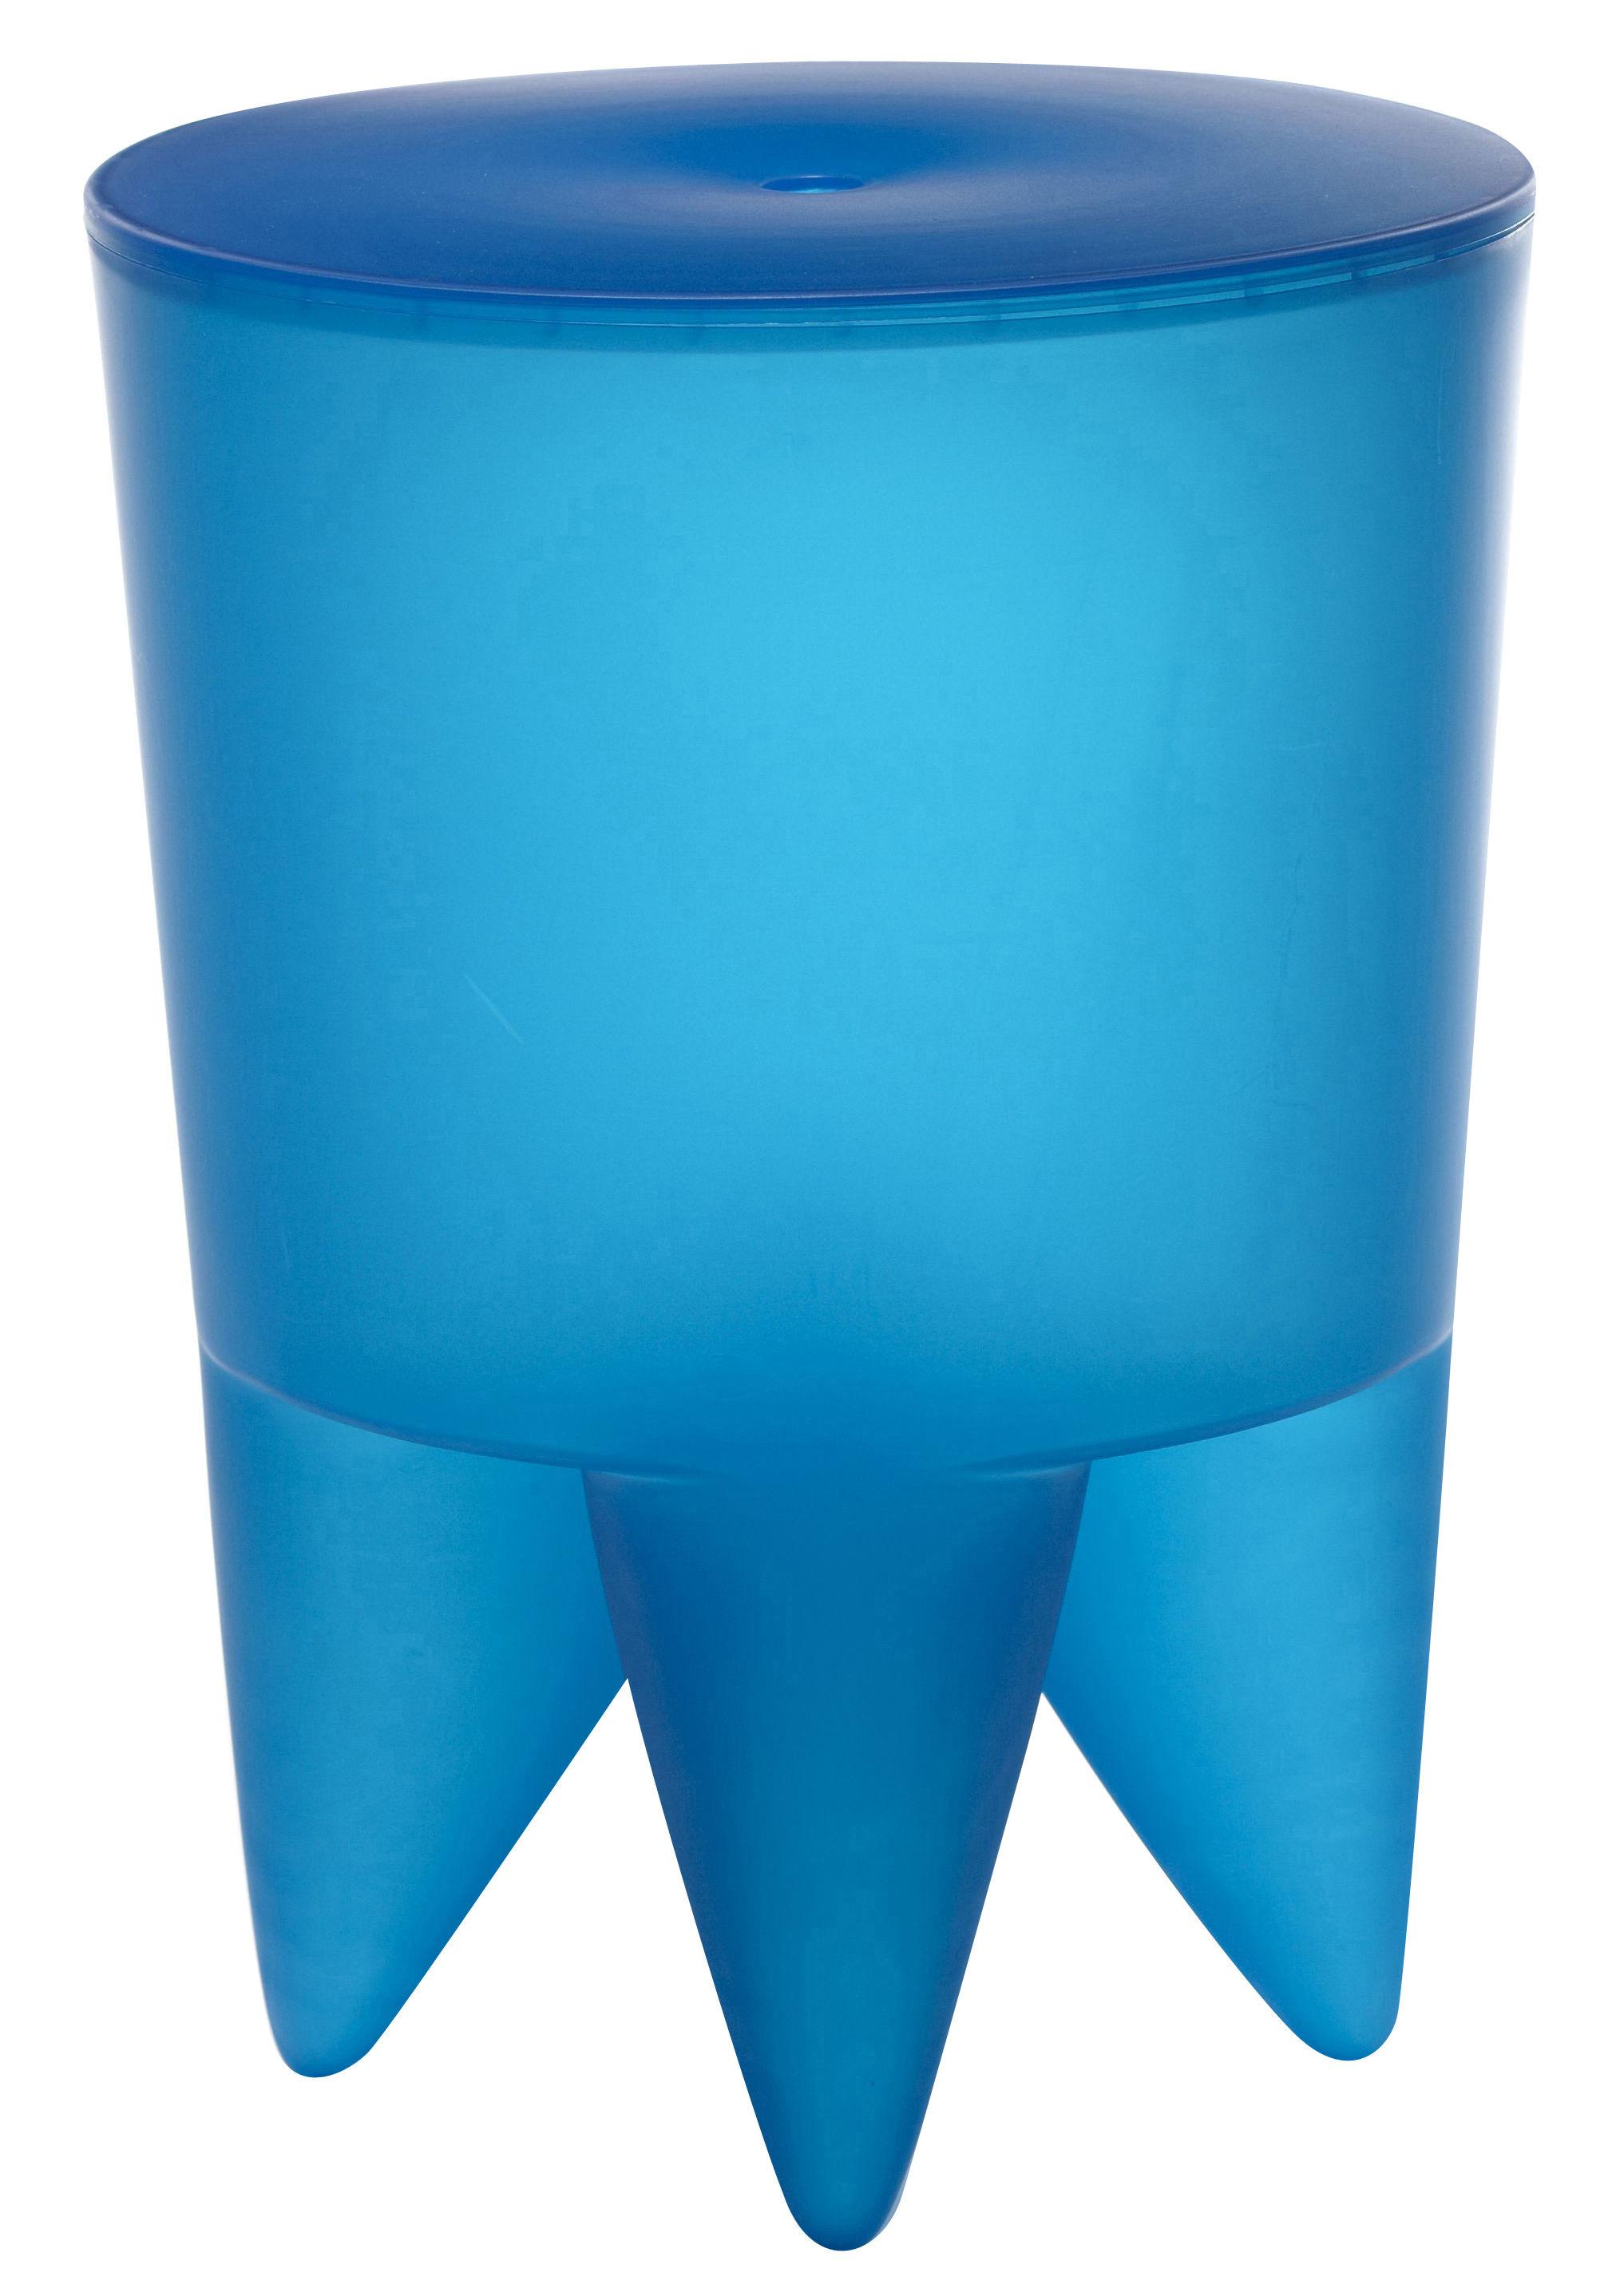 Tabouret new bubu 1er coffre plastique azure - Tabouret bubu philippe starck ...